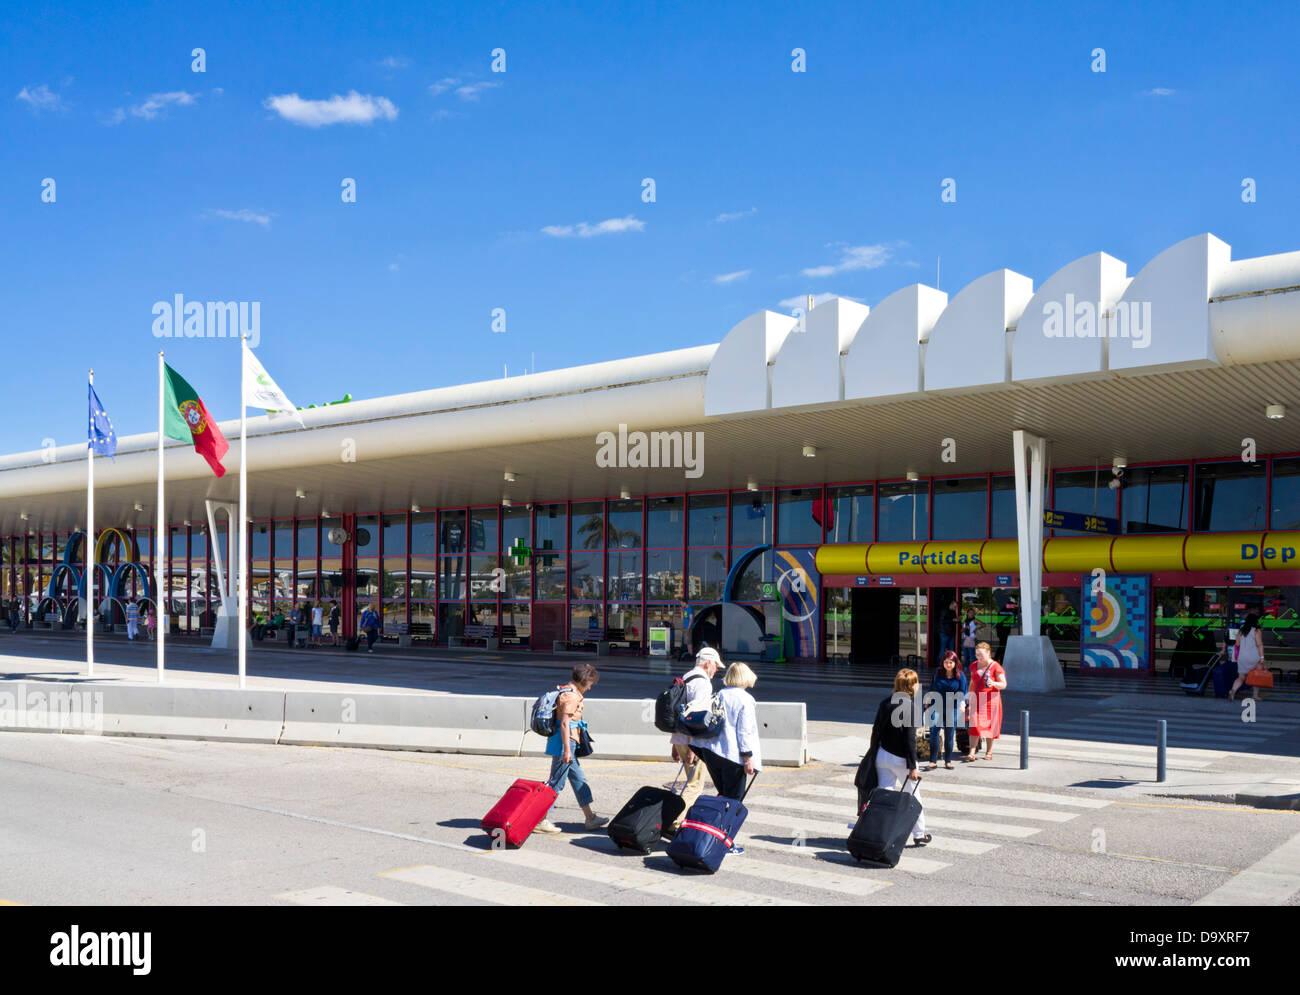 Terminal Building Faro Airport Algarve Portugal EU Europe - Stock Image